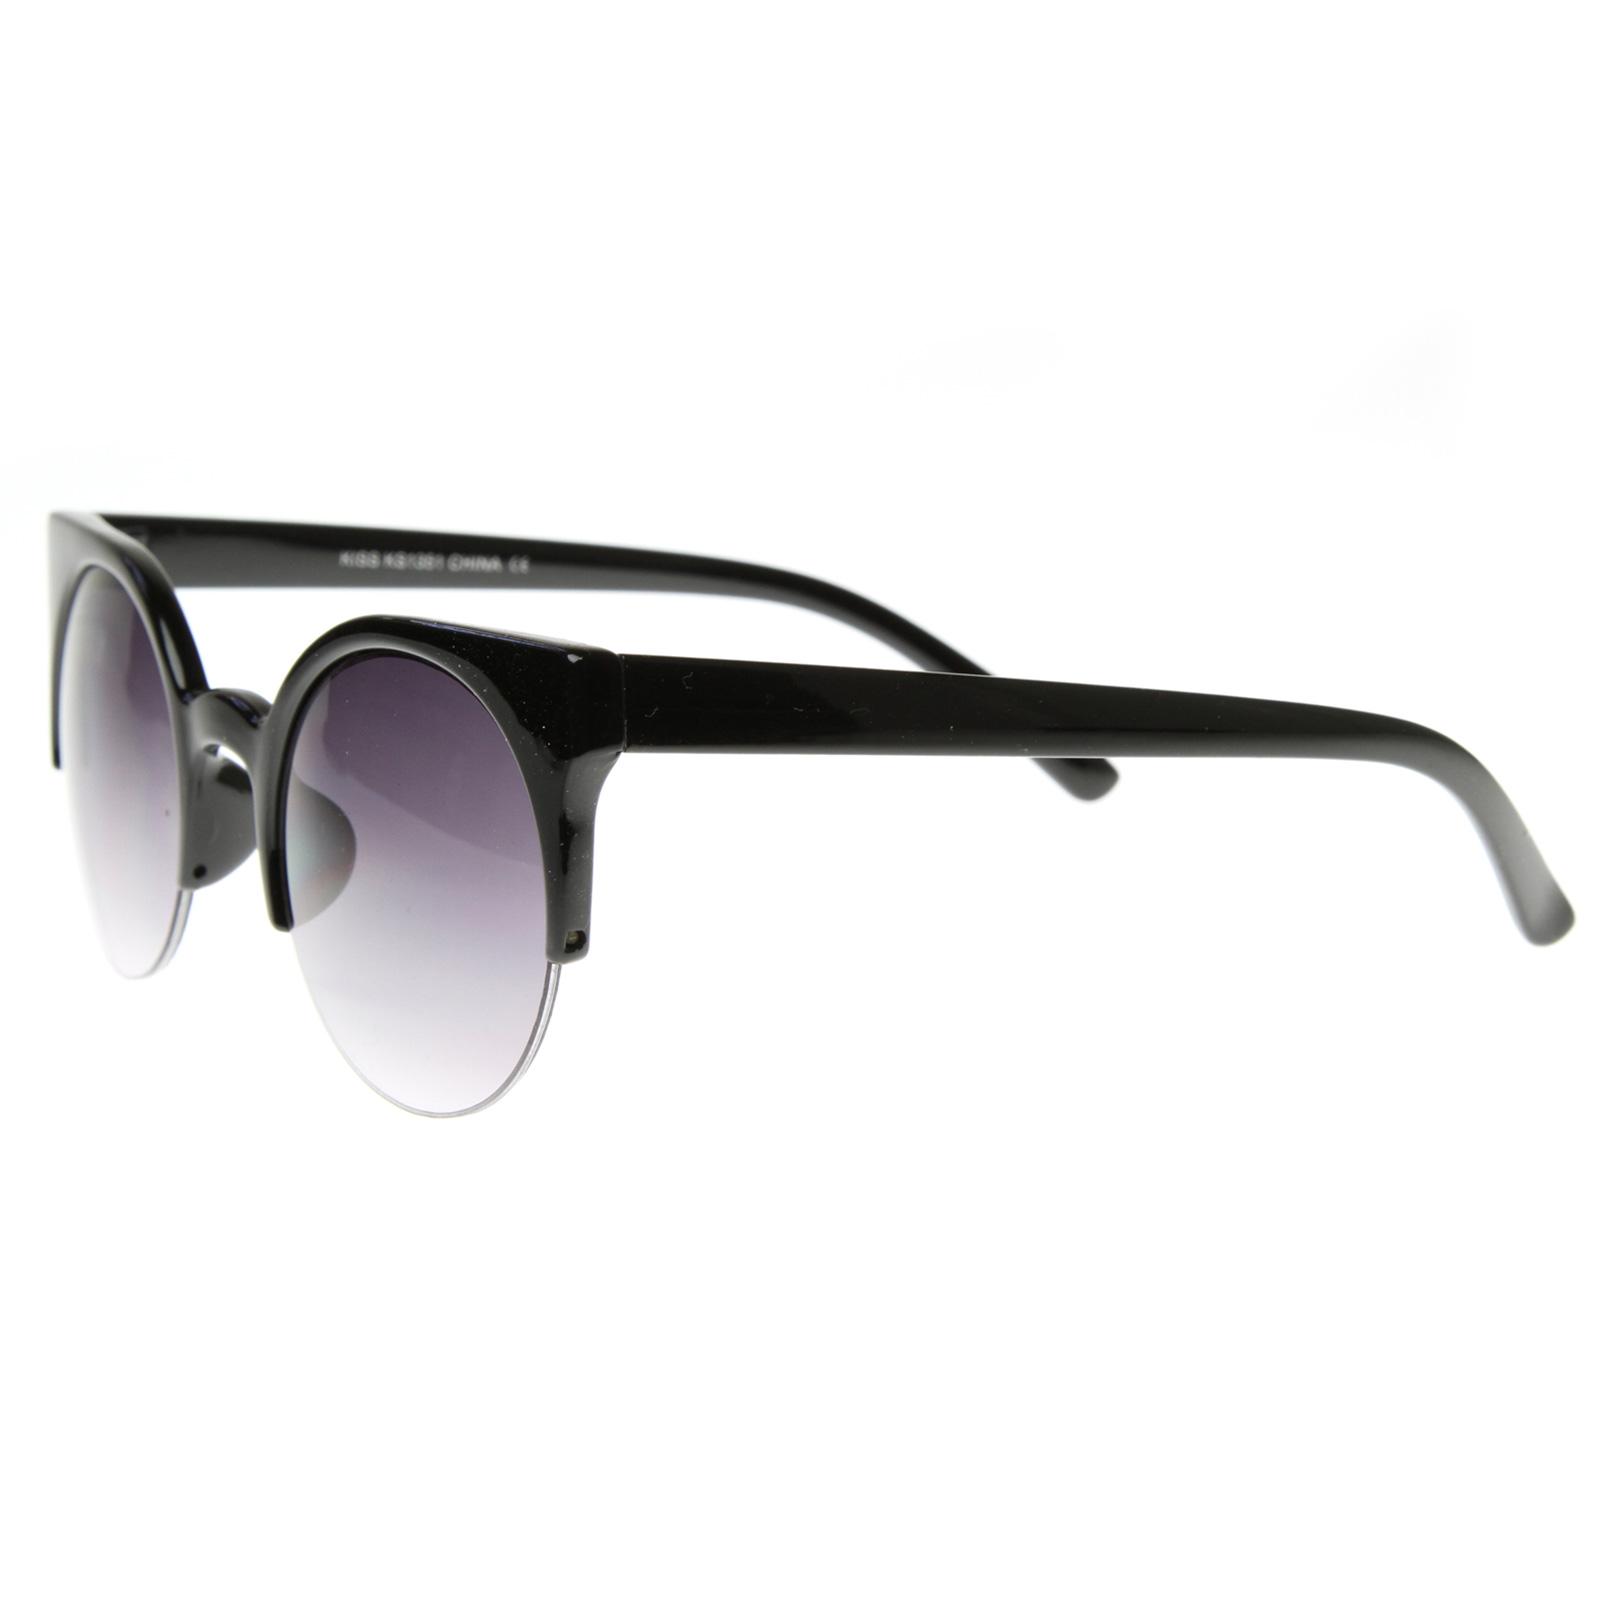 Designer Glasses Half Frame : Designer Inspired Round Circle Cat Eye Semi-Rimless Half ...